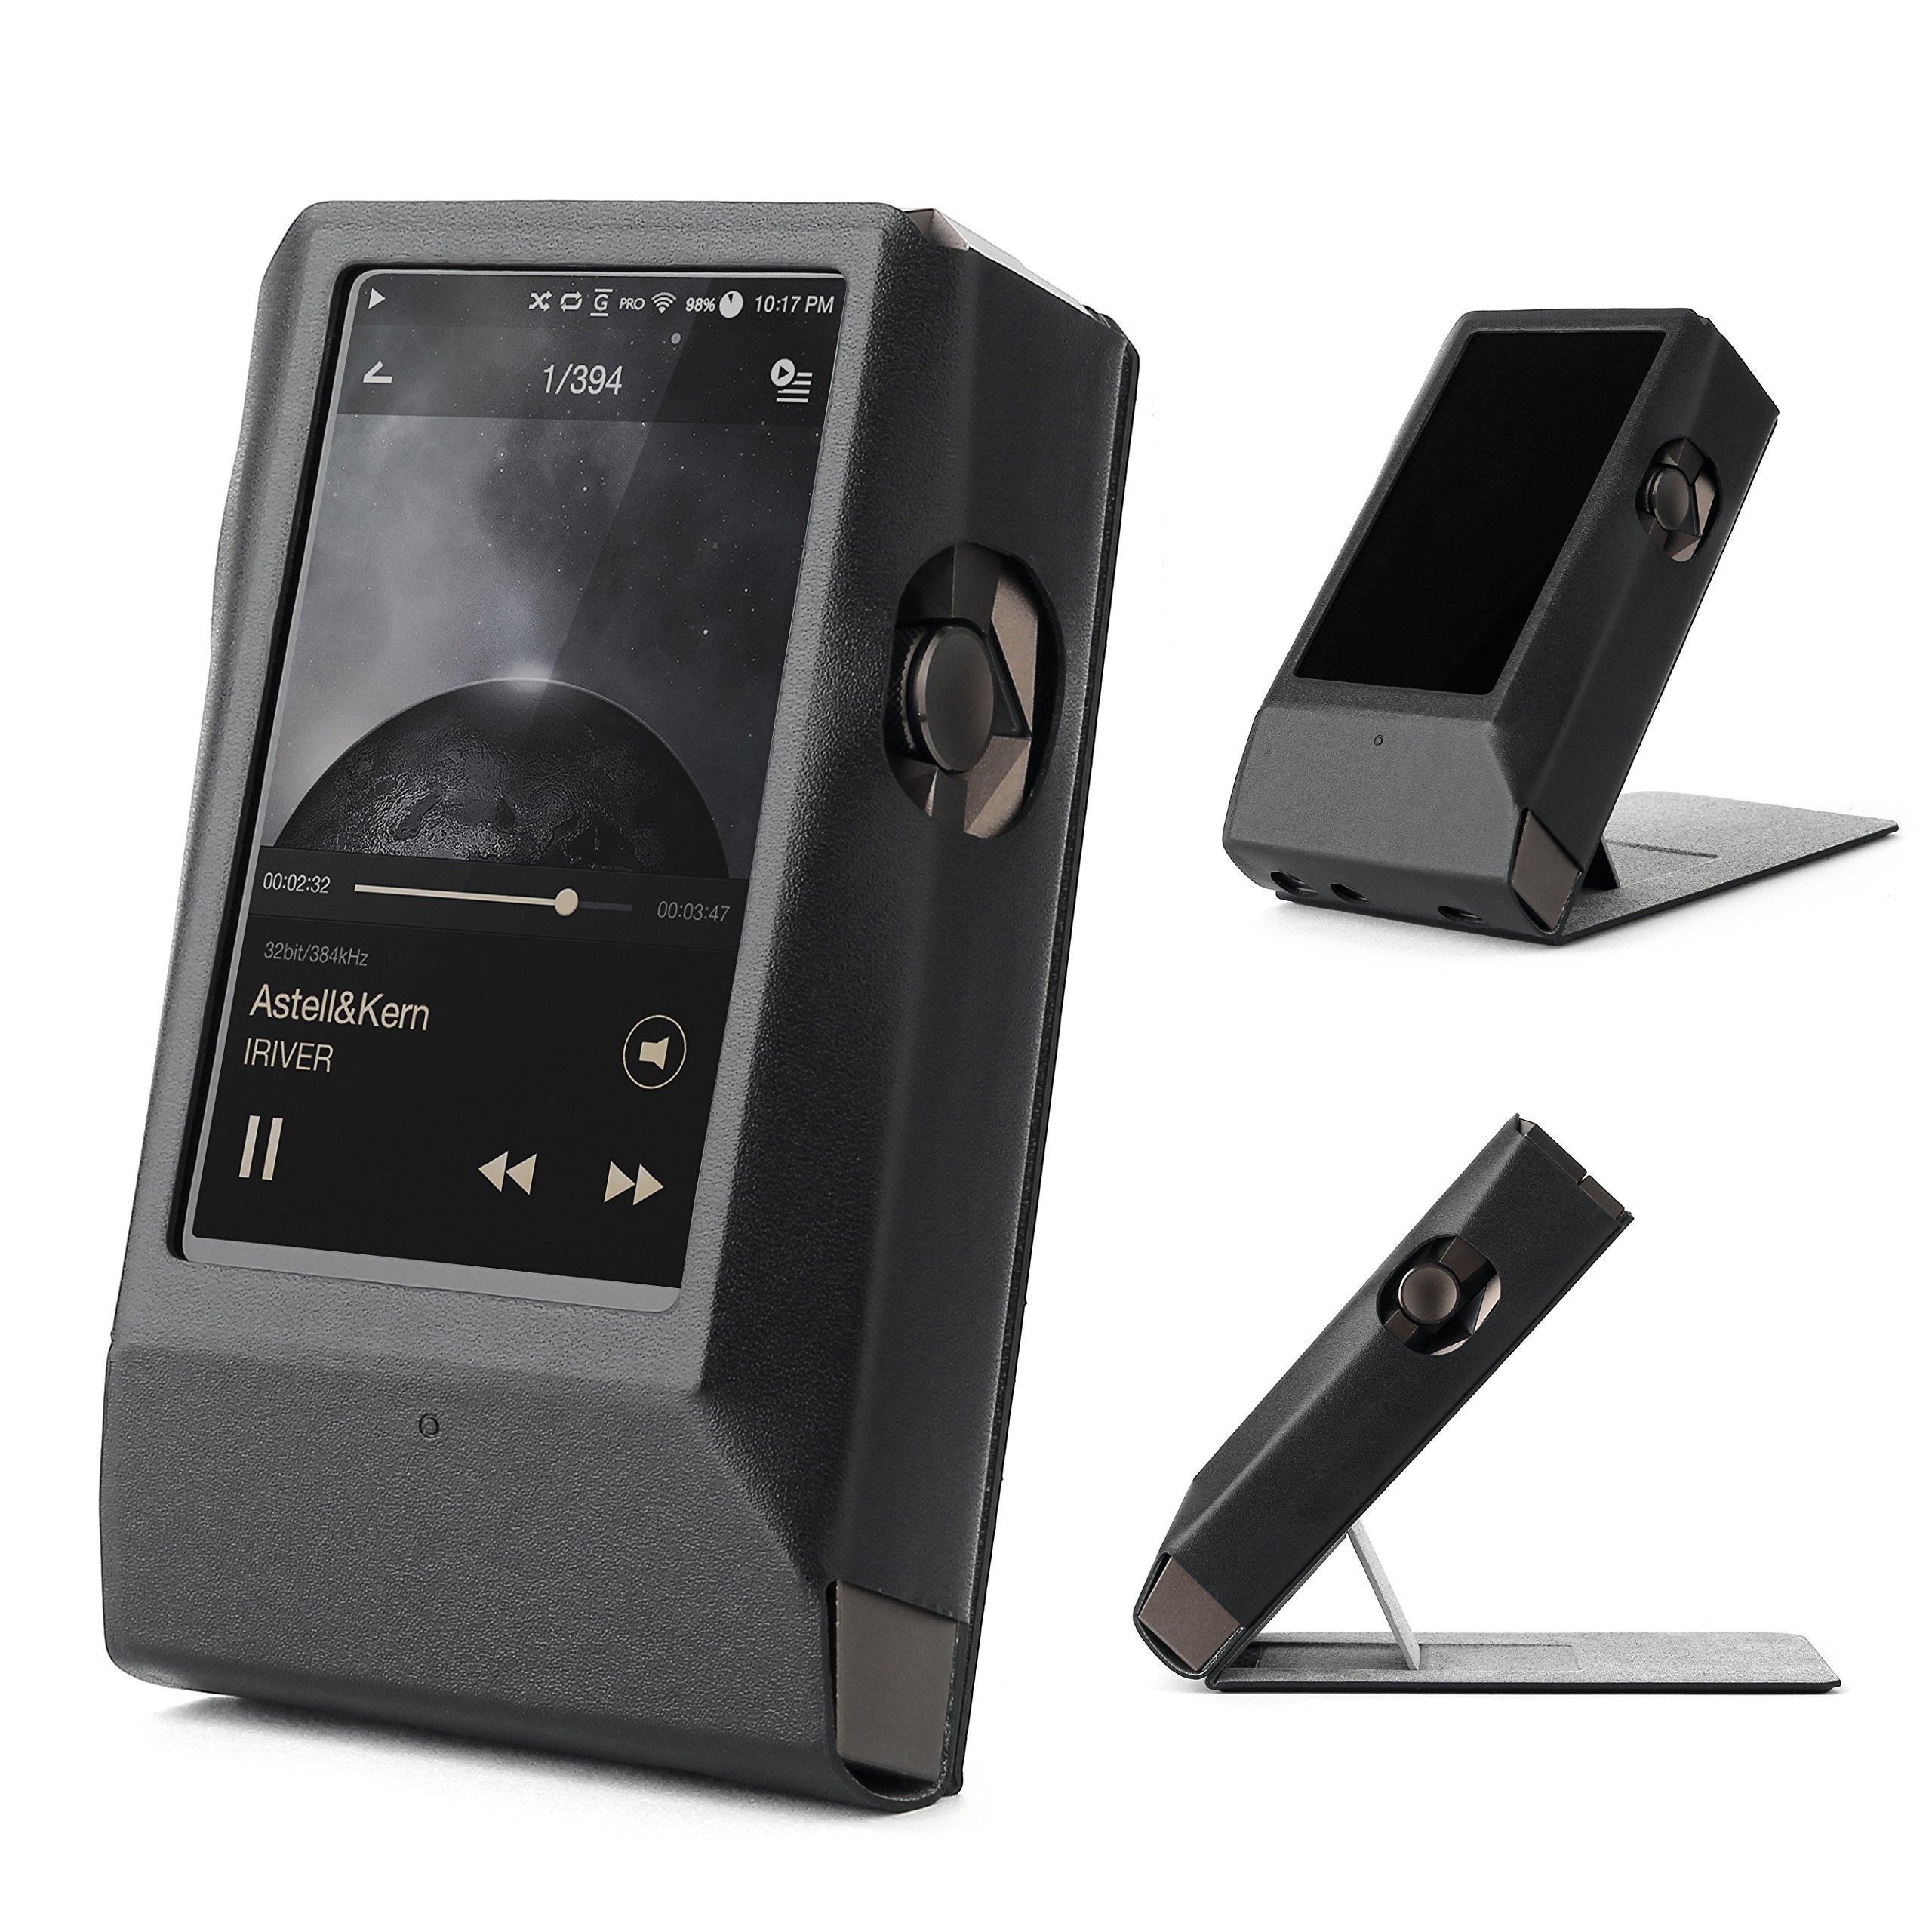 Astell&Kern AK380 AMP Hand Crafted MITER Leather Case Cover [Patented Stand Case] astell&Kern Leather case ak380 amp case (Black)